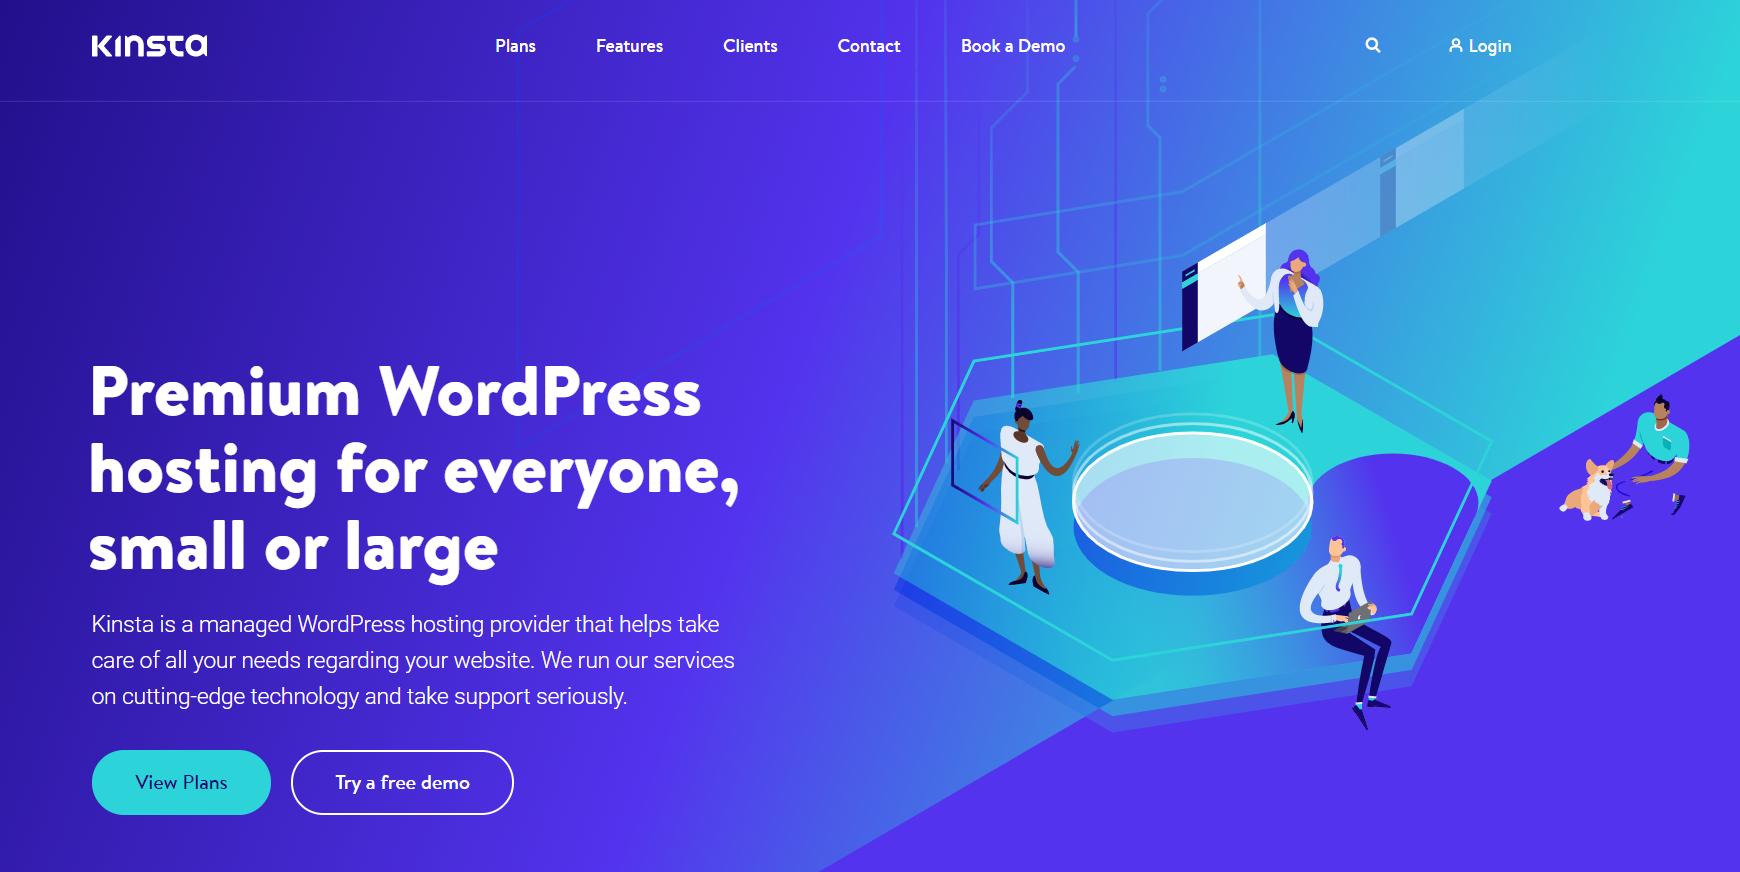 kinsta web hosting - digitally atanu